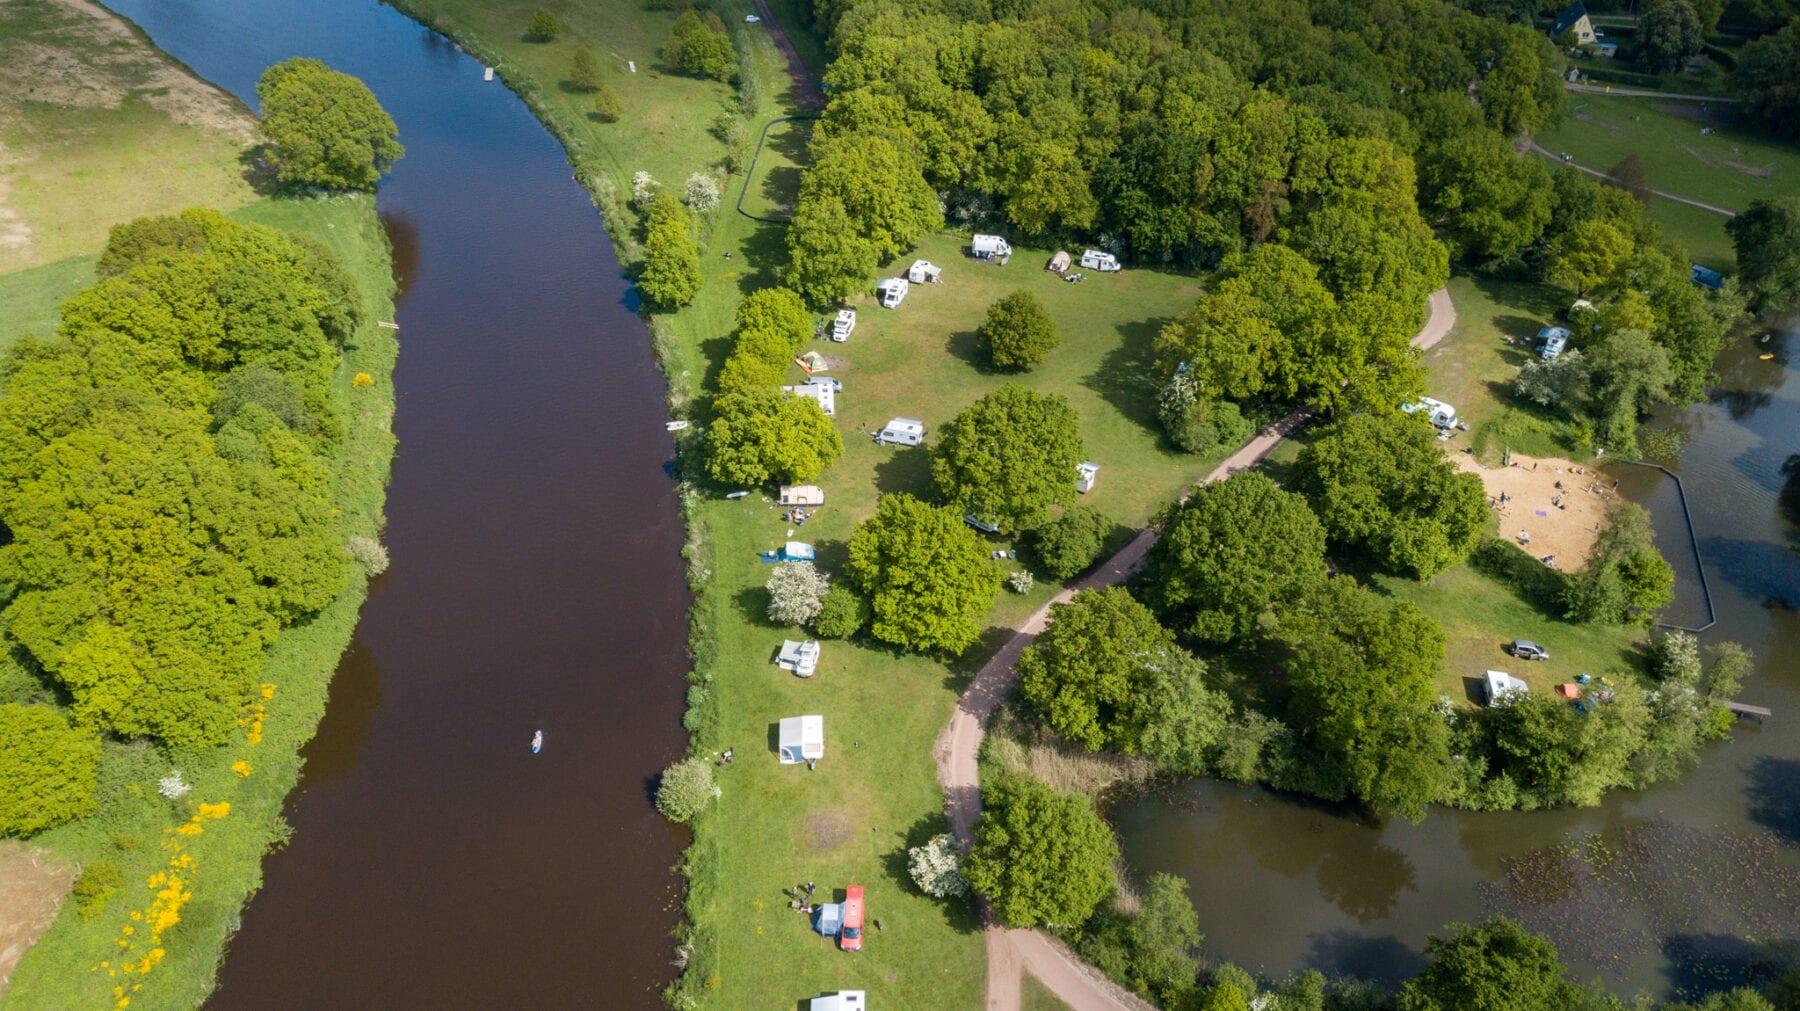 Huttopia Camping de Roos drone foto